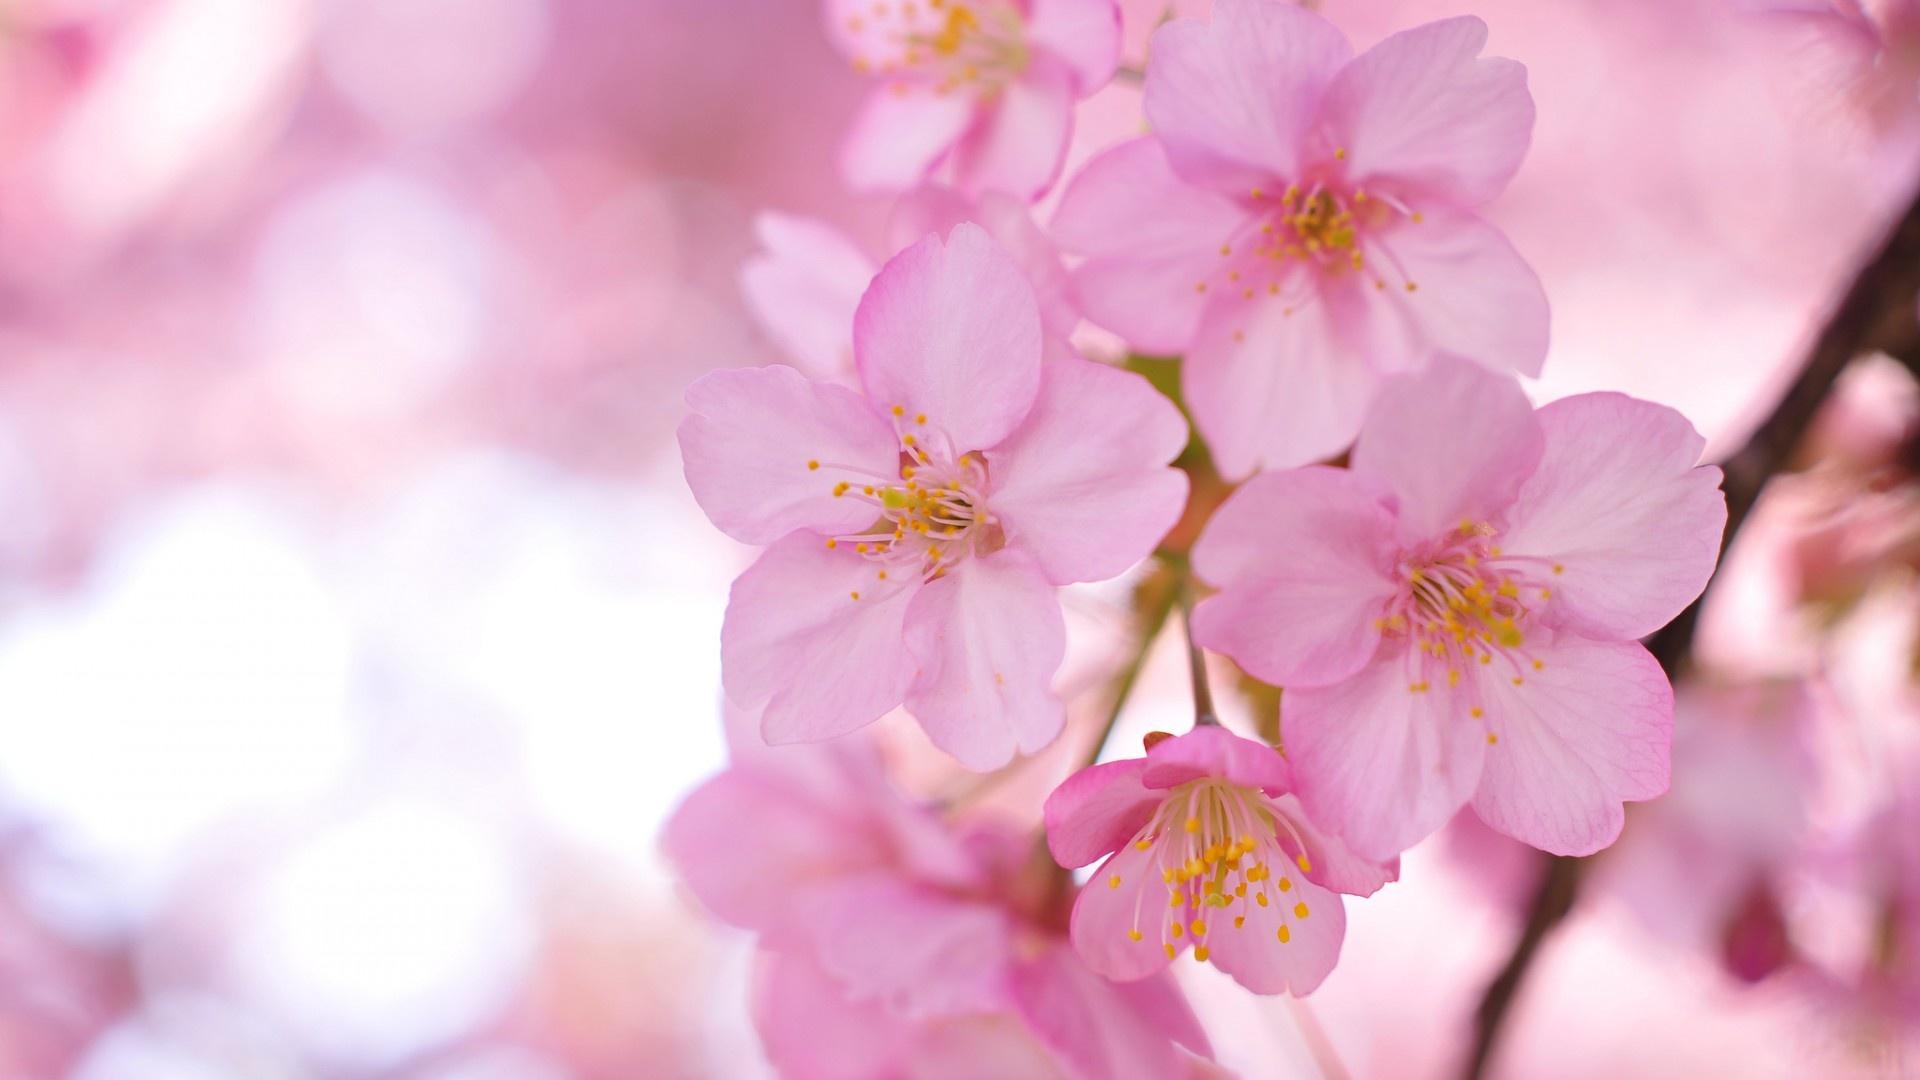 Pink Flower Wallpaper - WallpaperSafari